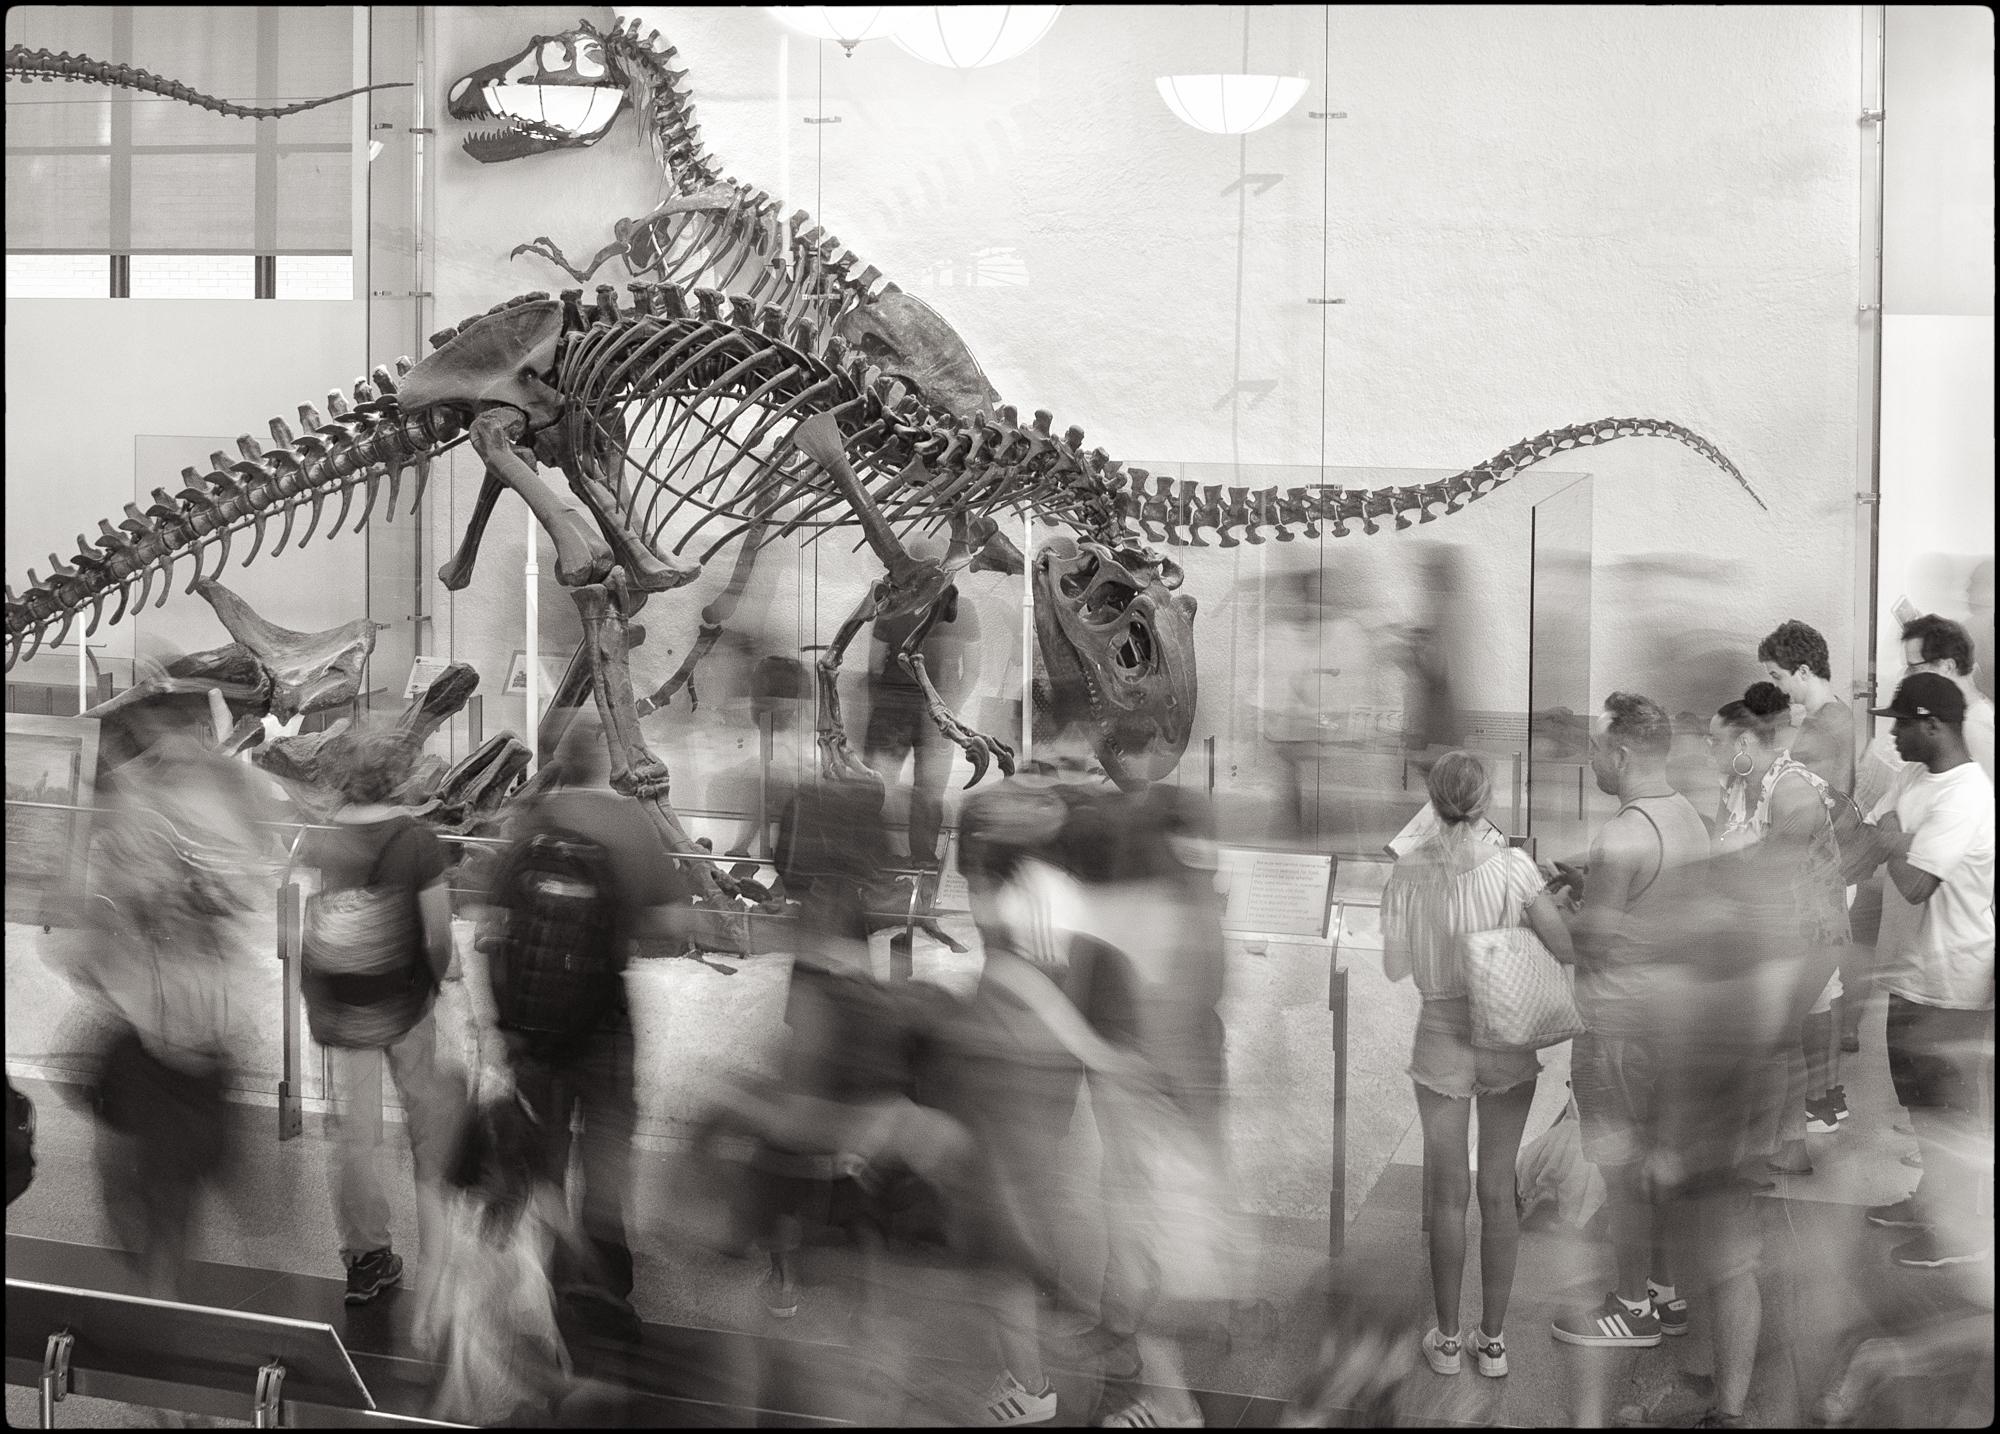 dinosaurs and blur-1.jpg